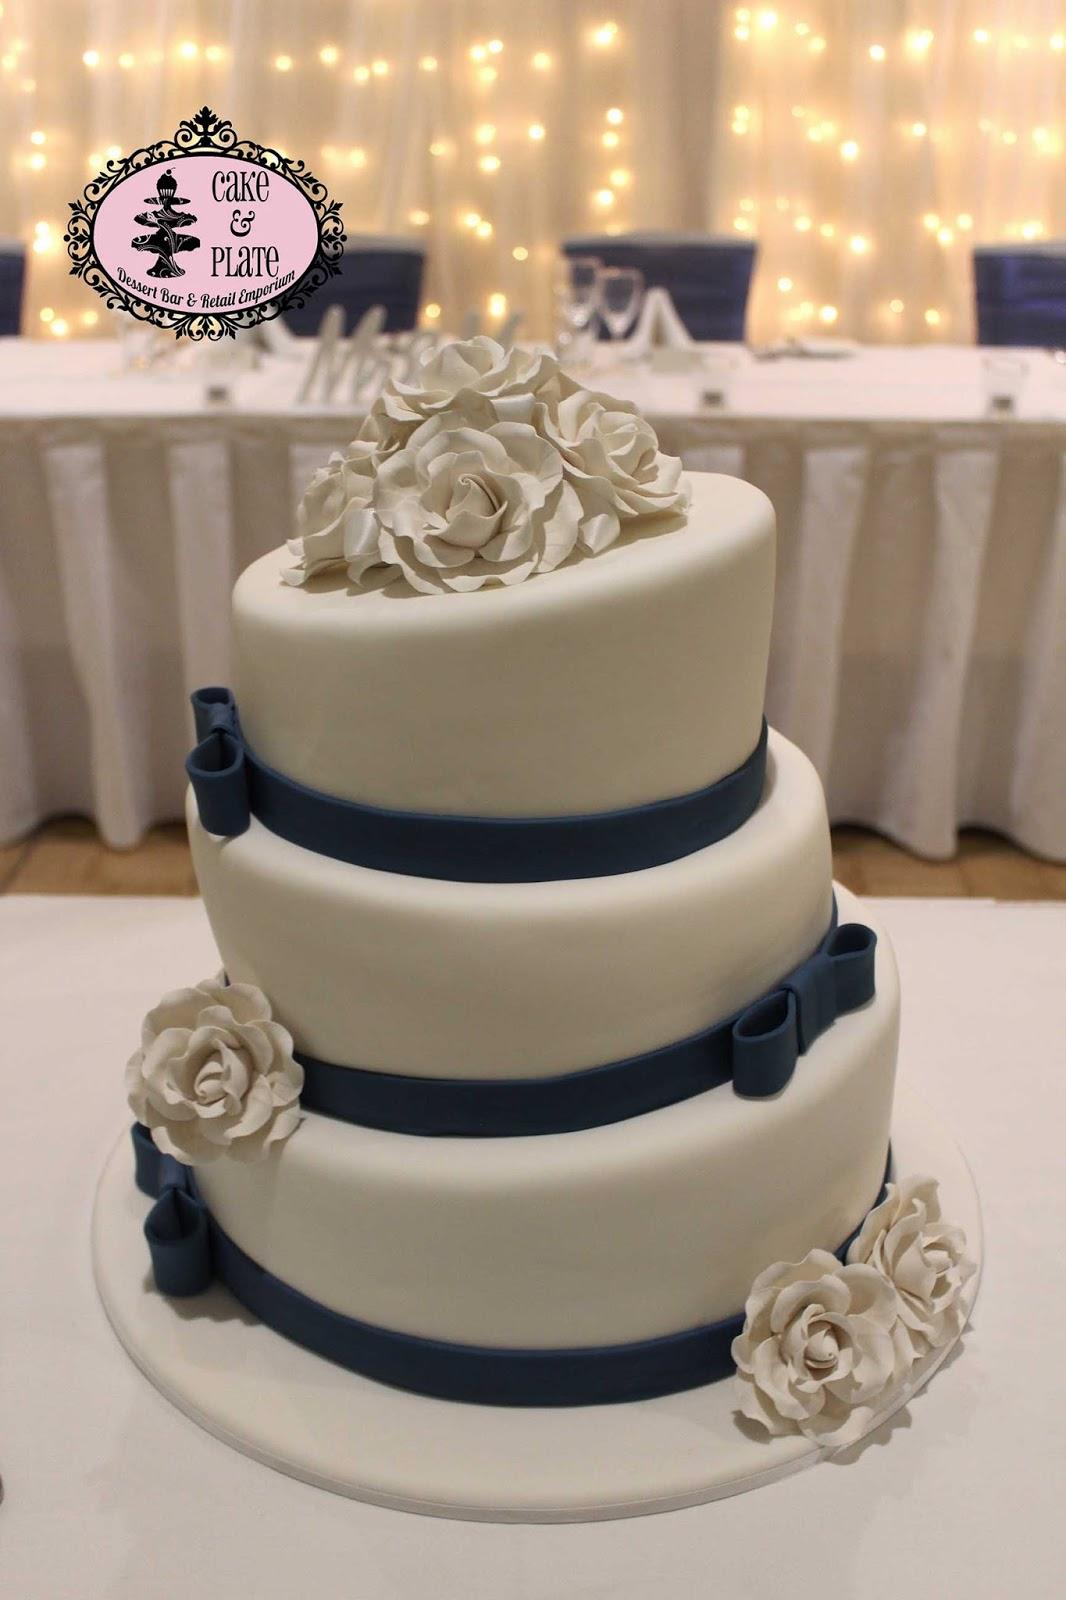 Cake & Plate